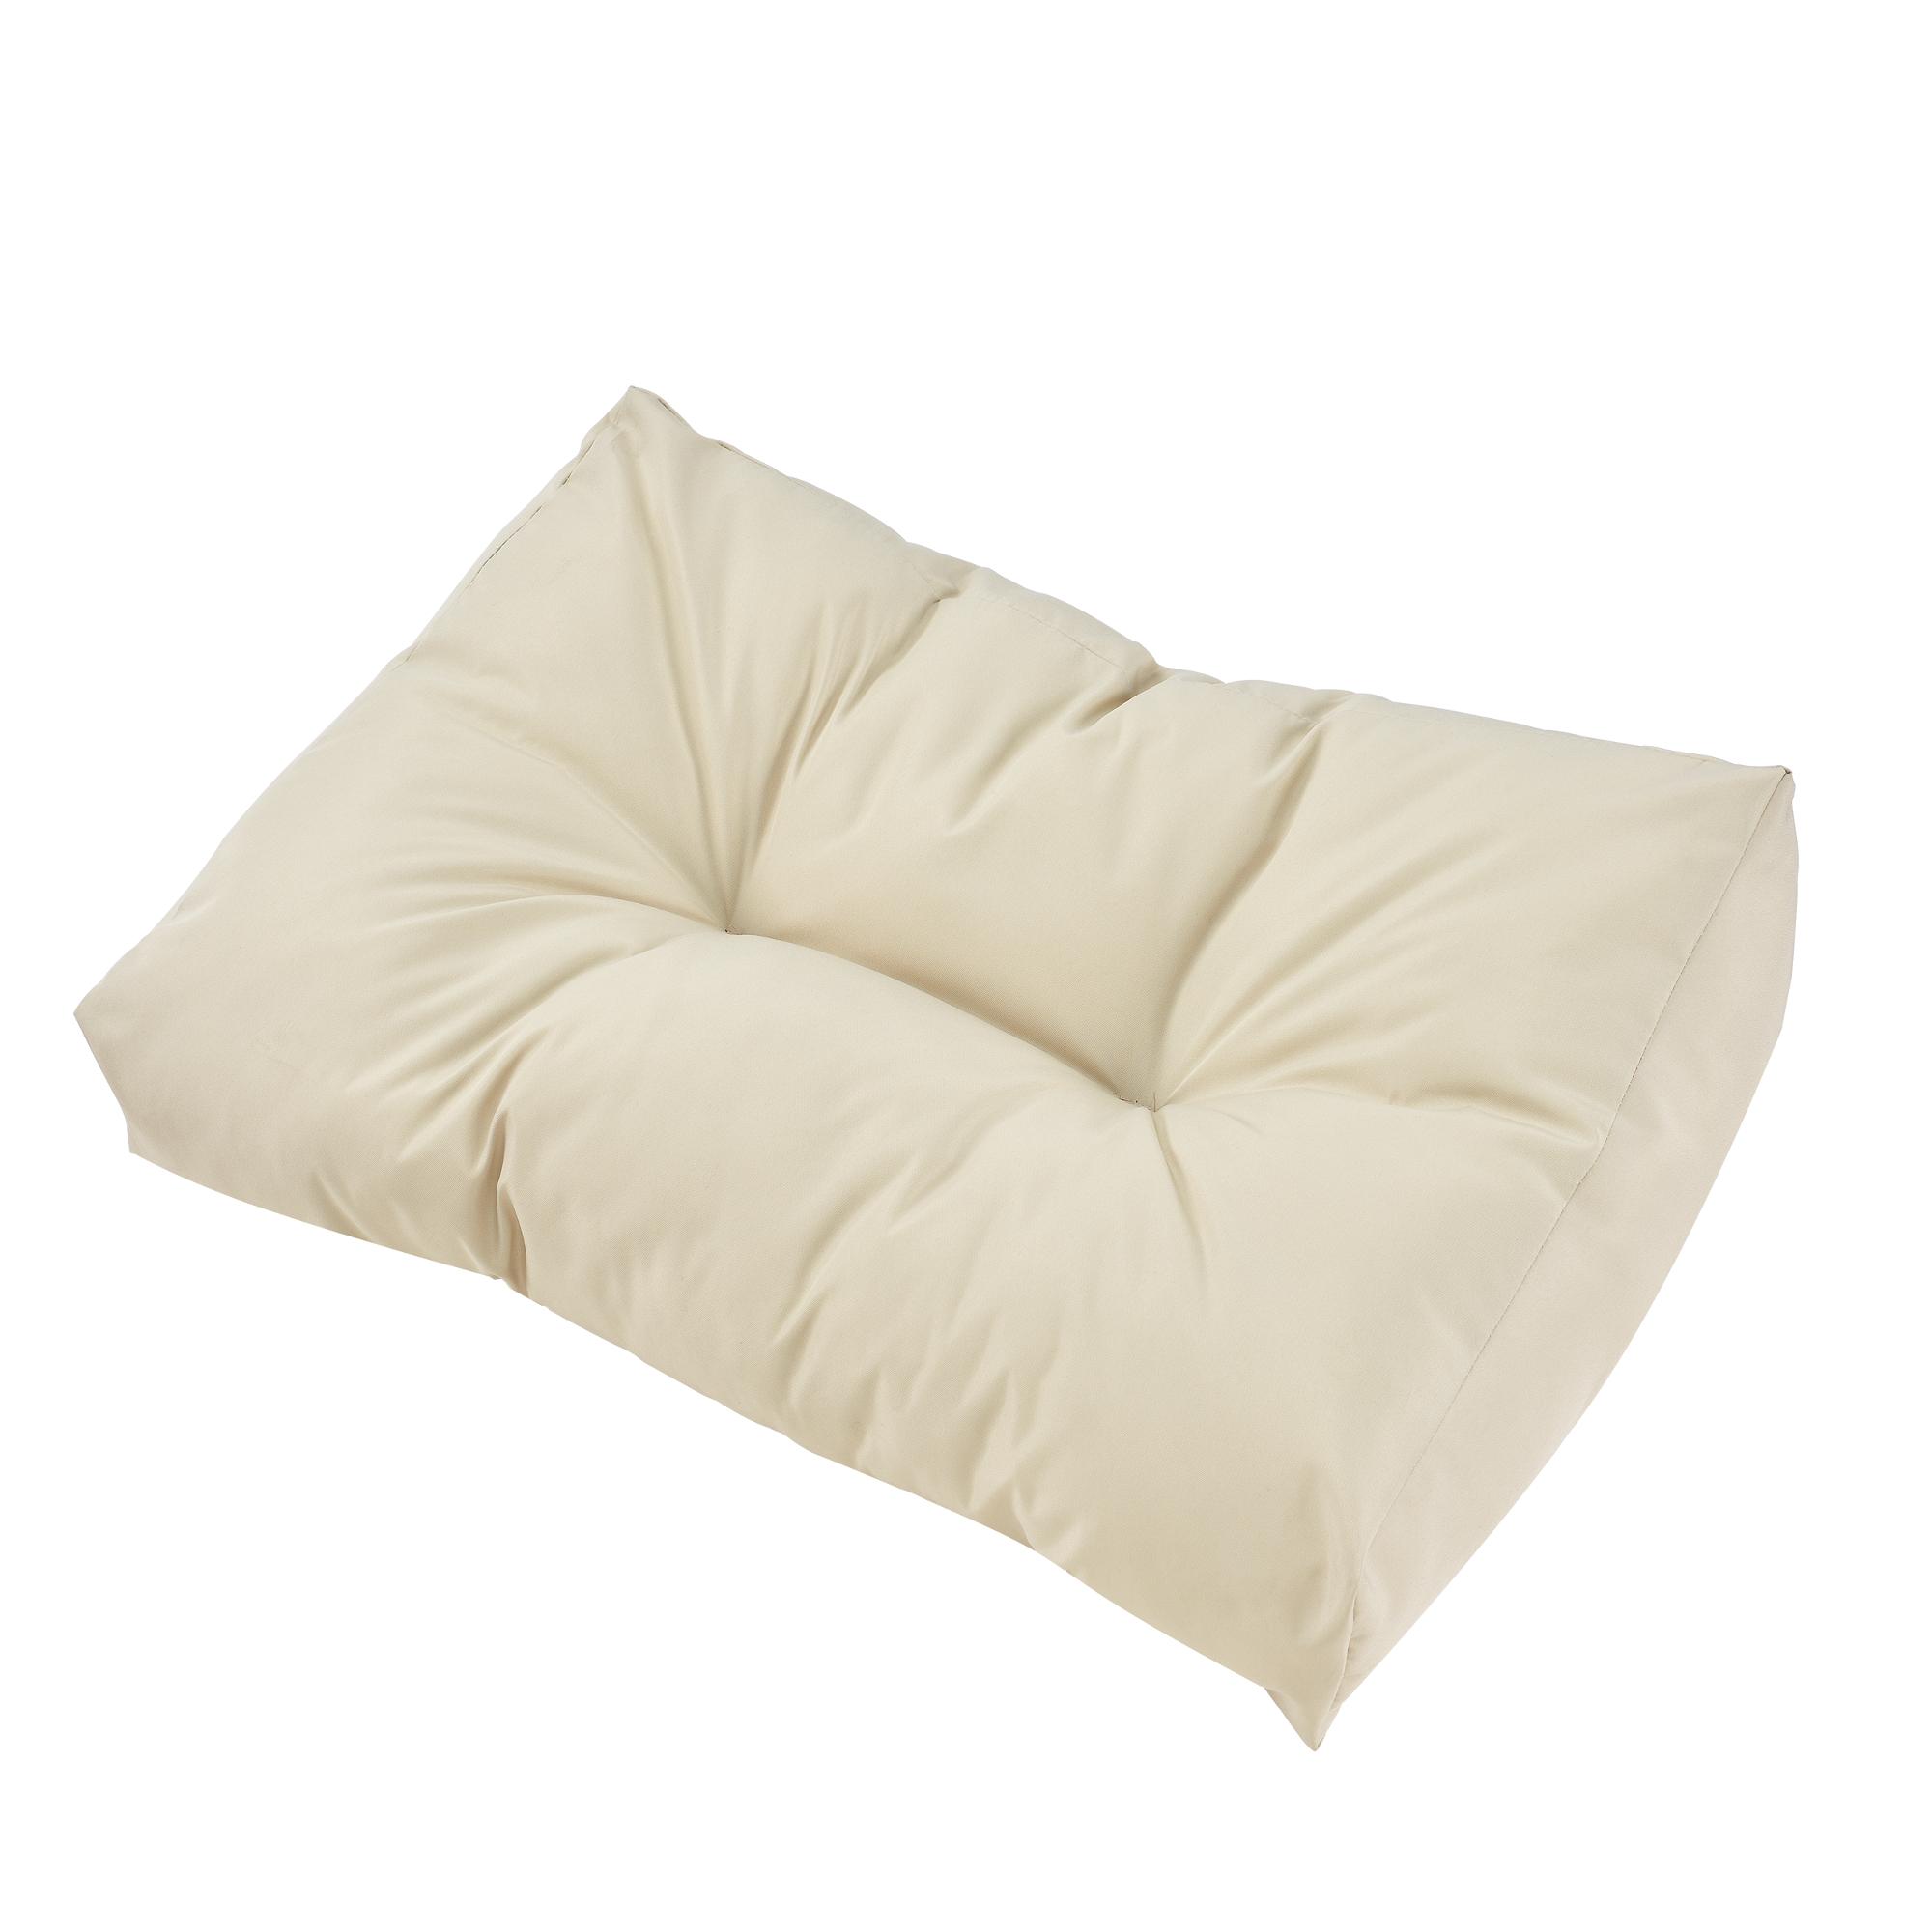 Palettenkissen in outdoor paletten kissen sofa polster sitzauflage Paletten sofa polster